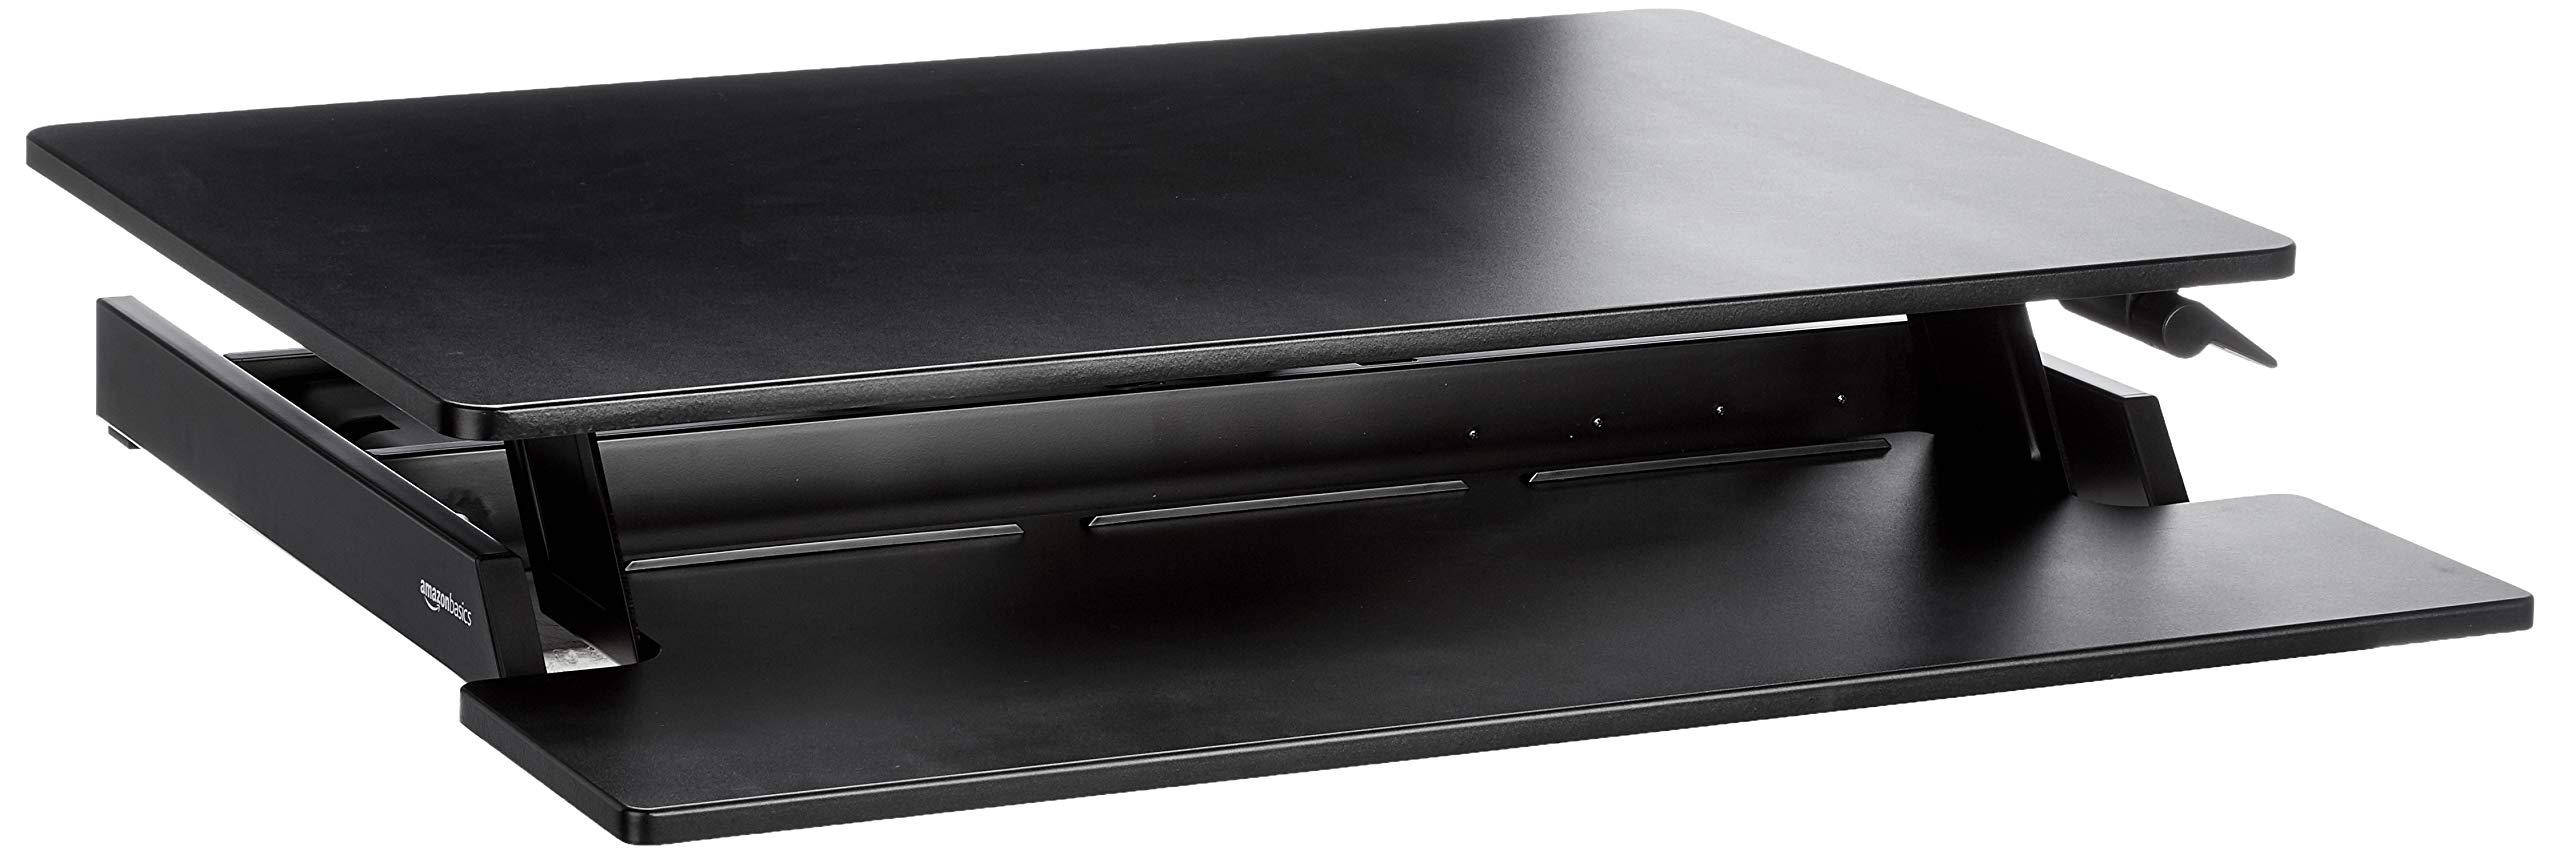 AmazonBasics Height Adjustable Standing Desk Converter with Keyboard Tray by AmazonBasics